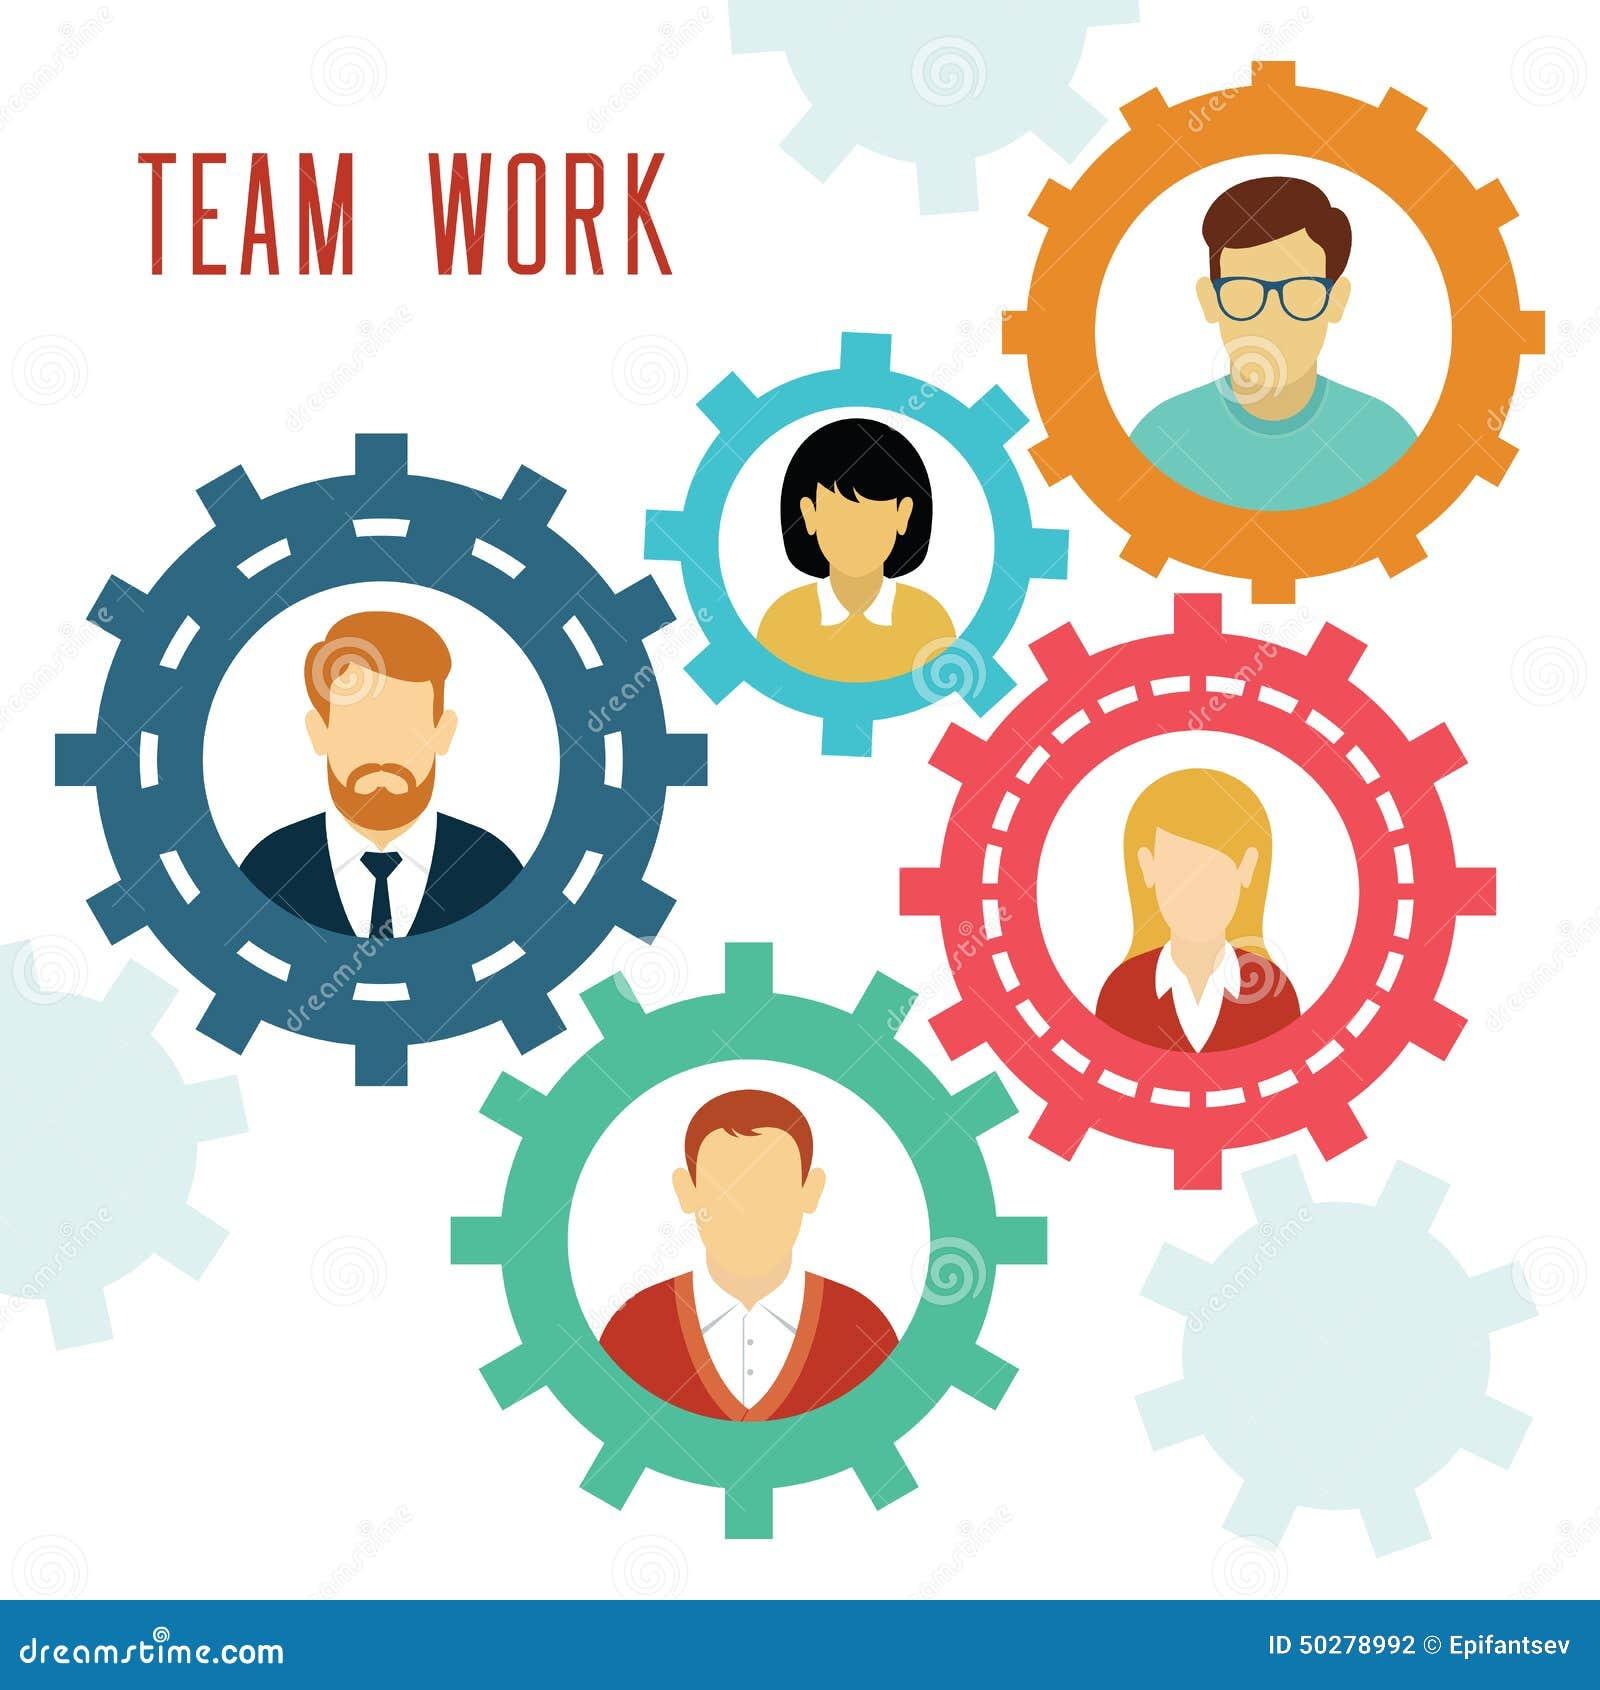 Vector Teamwork Gears Concept. Stock Vector - Image: 50278992